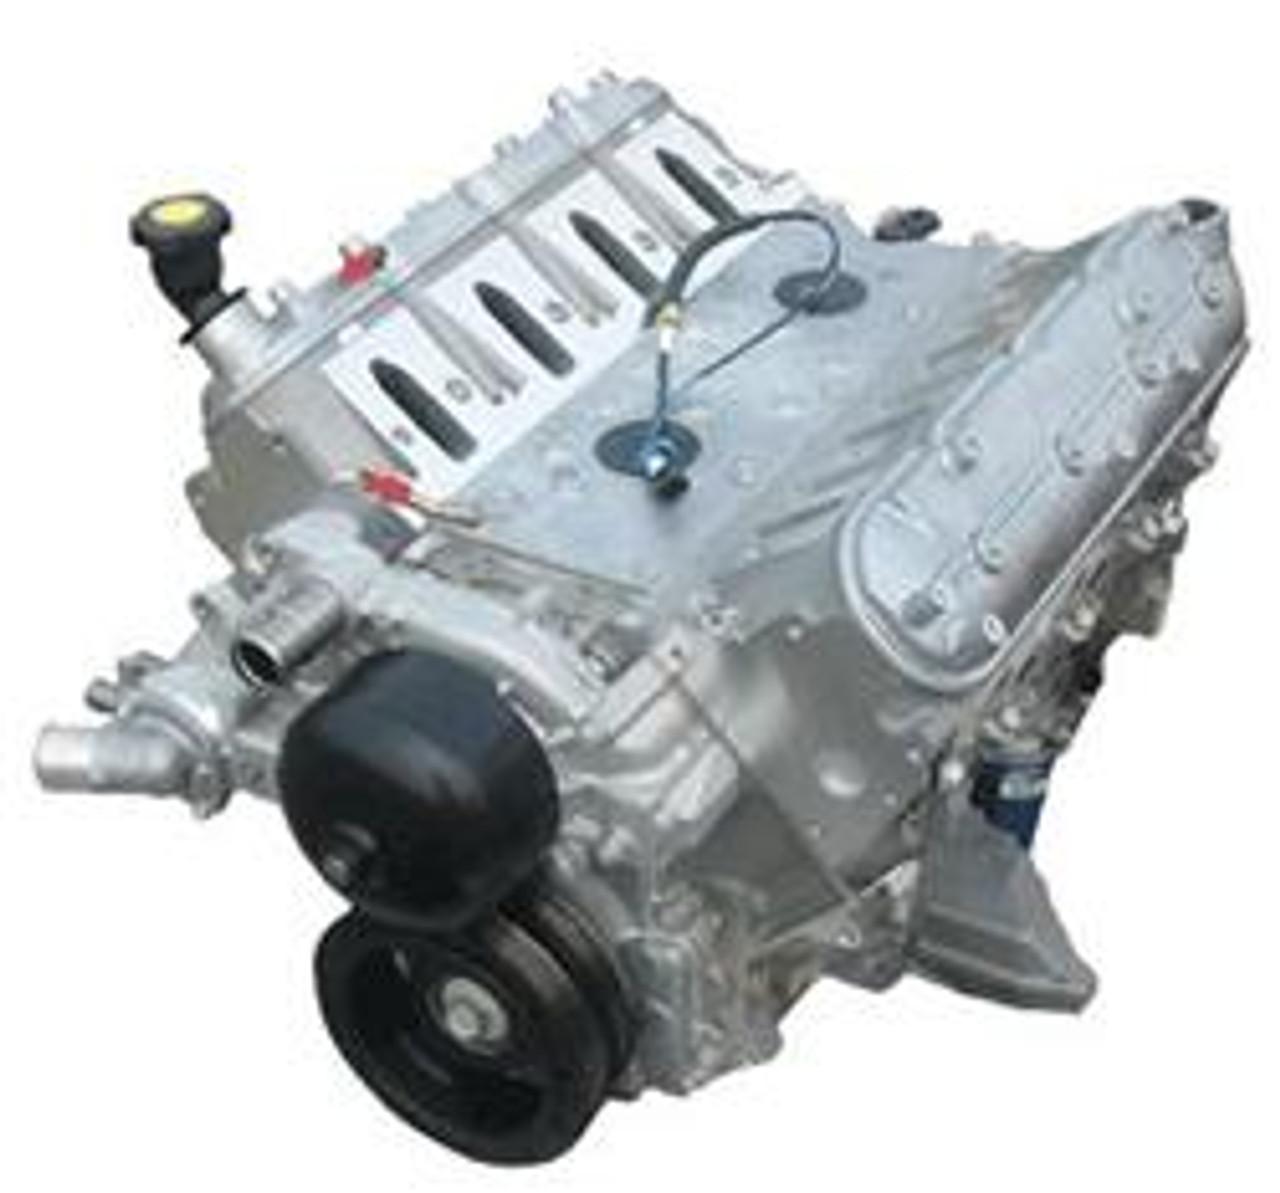 LS1 Engine Rebuild Kit